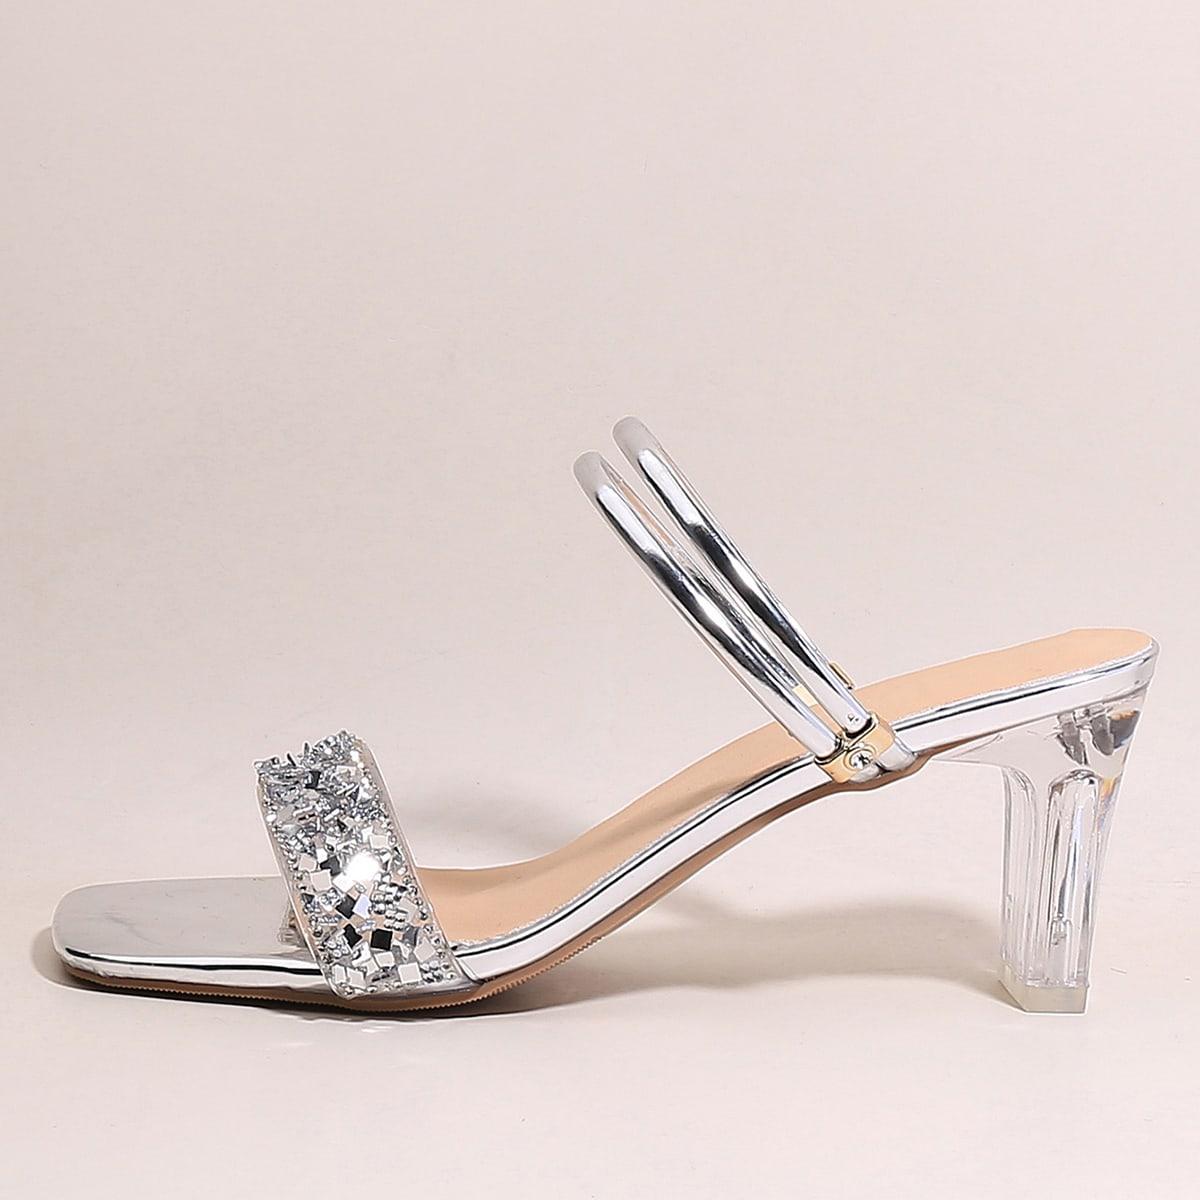 Сандалии на массивном каблуке со стразами